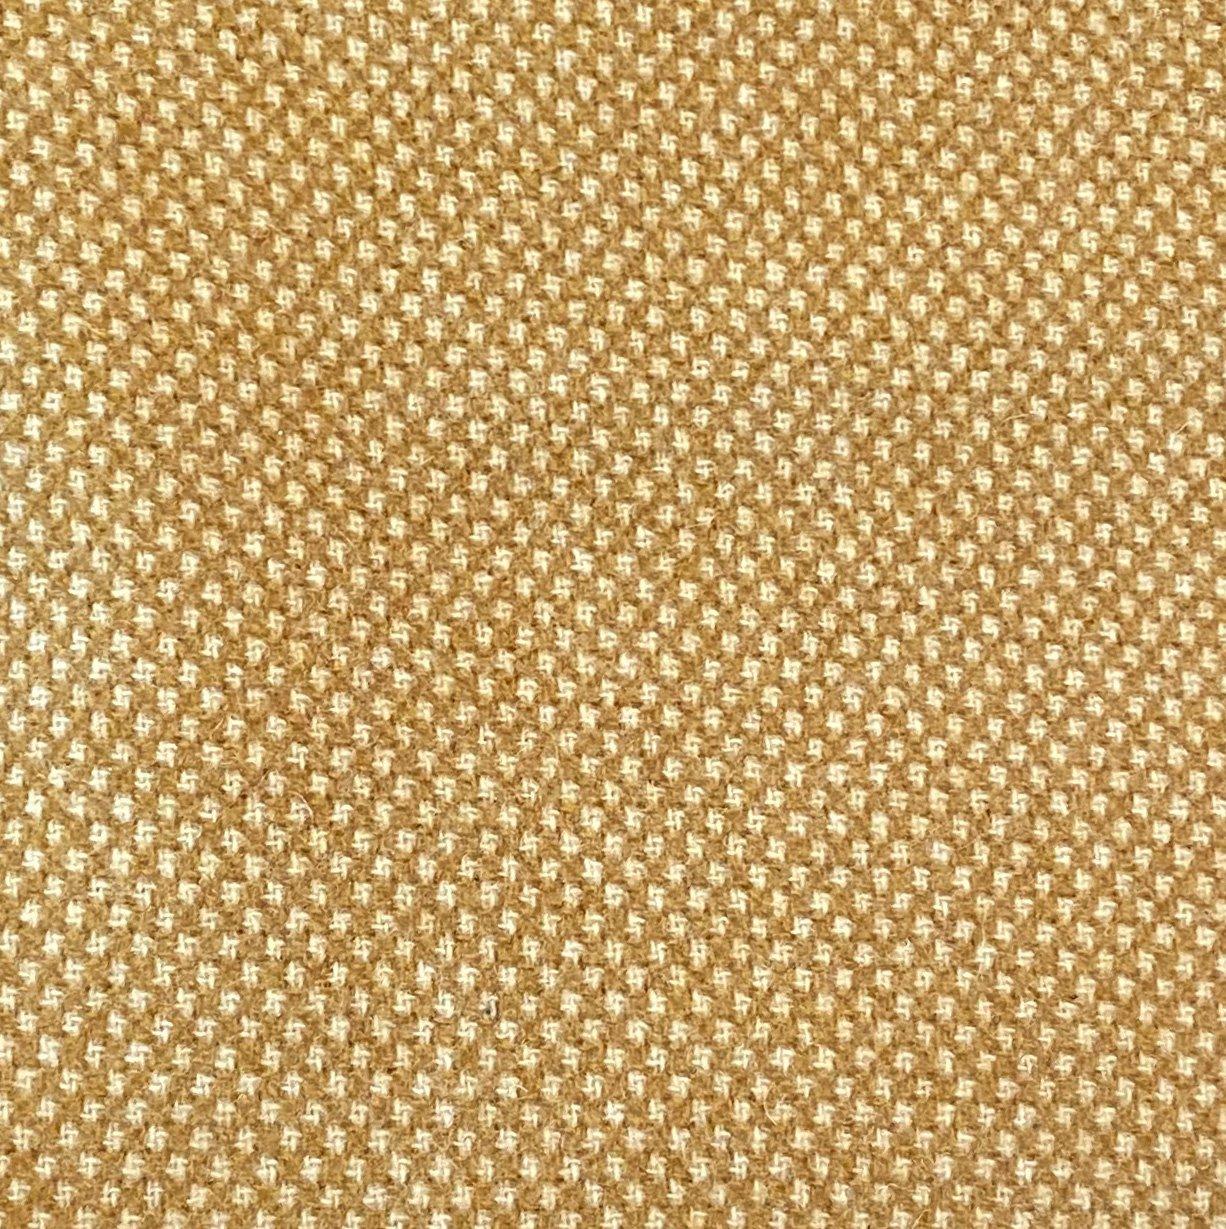 Honeycomb Gold 100% Wool